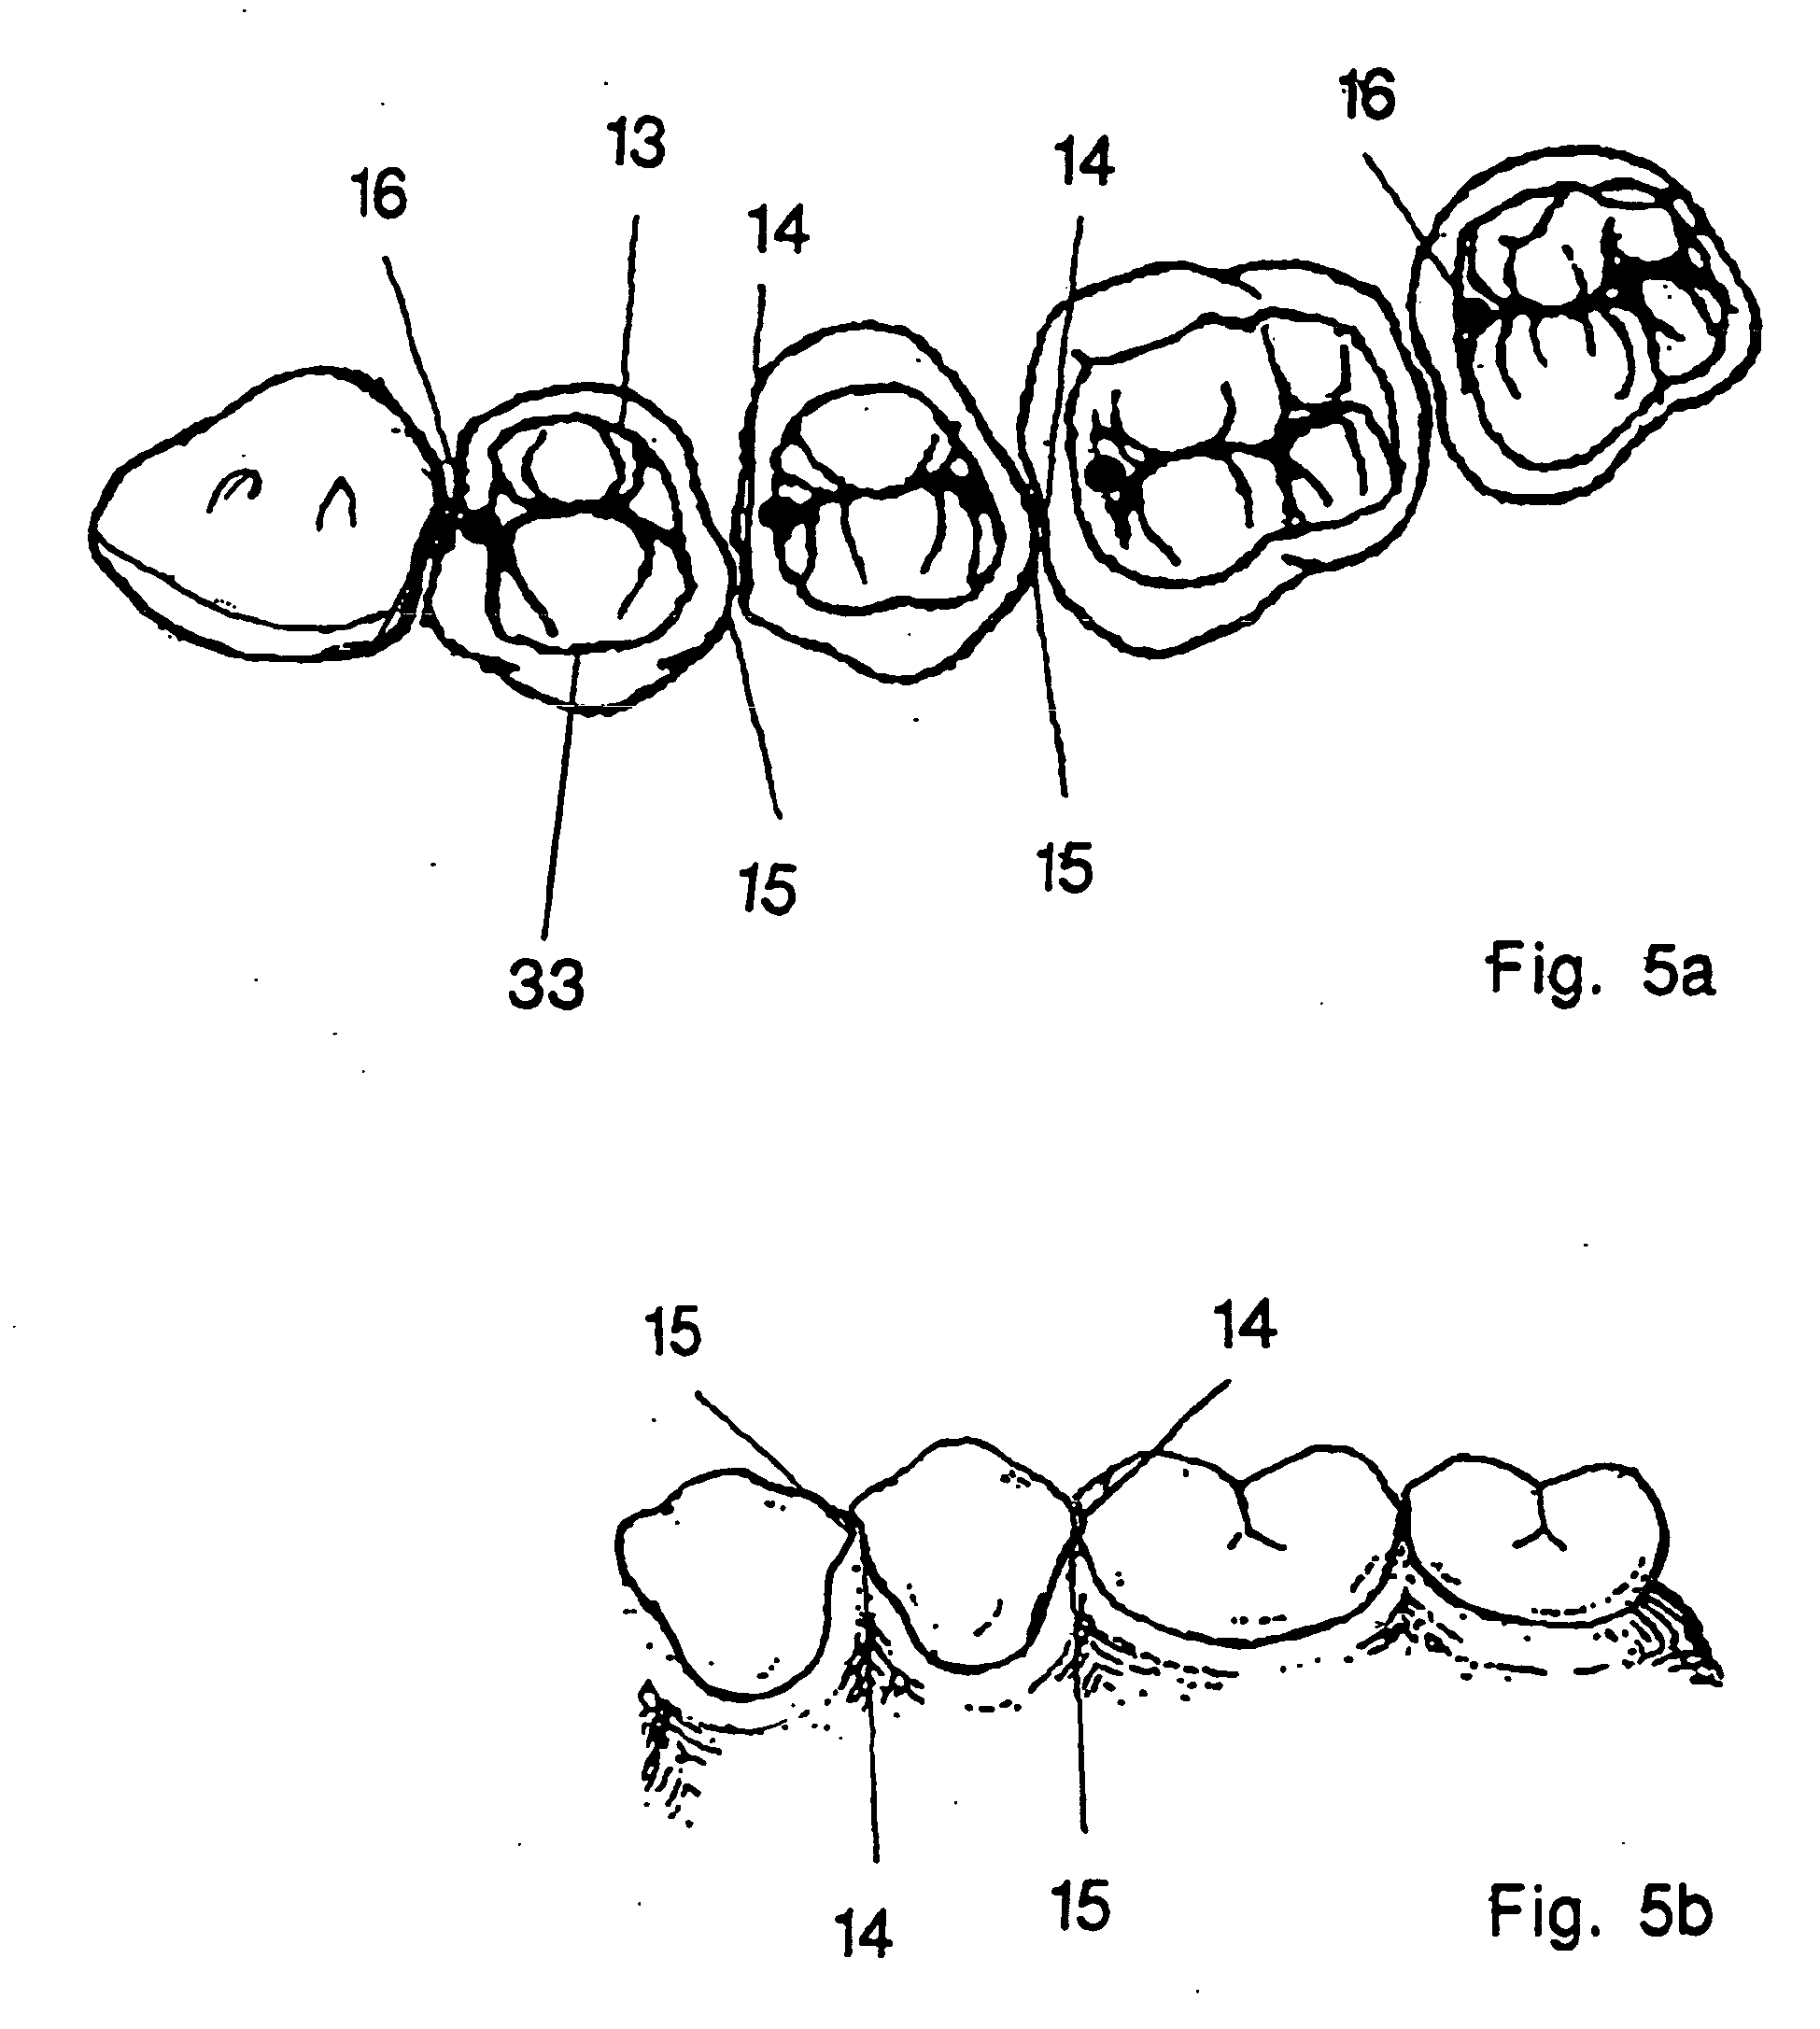 patent ep1022998b1 zahnsatz google patentsuche. Black Bedroom Furniture Sets. Home Design Ideas